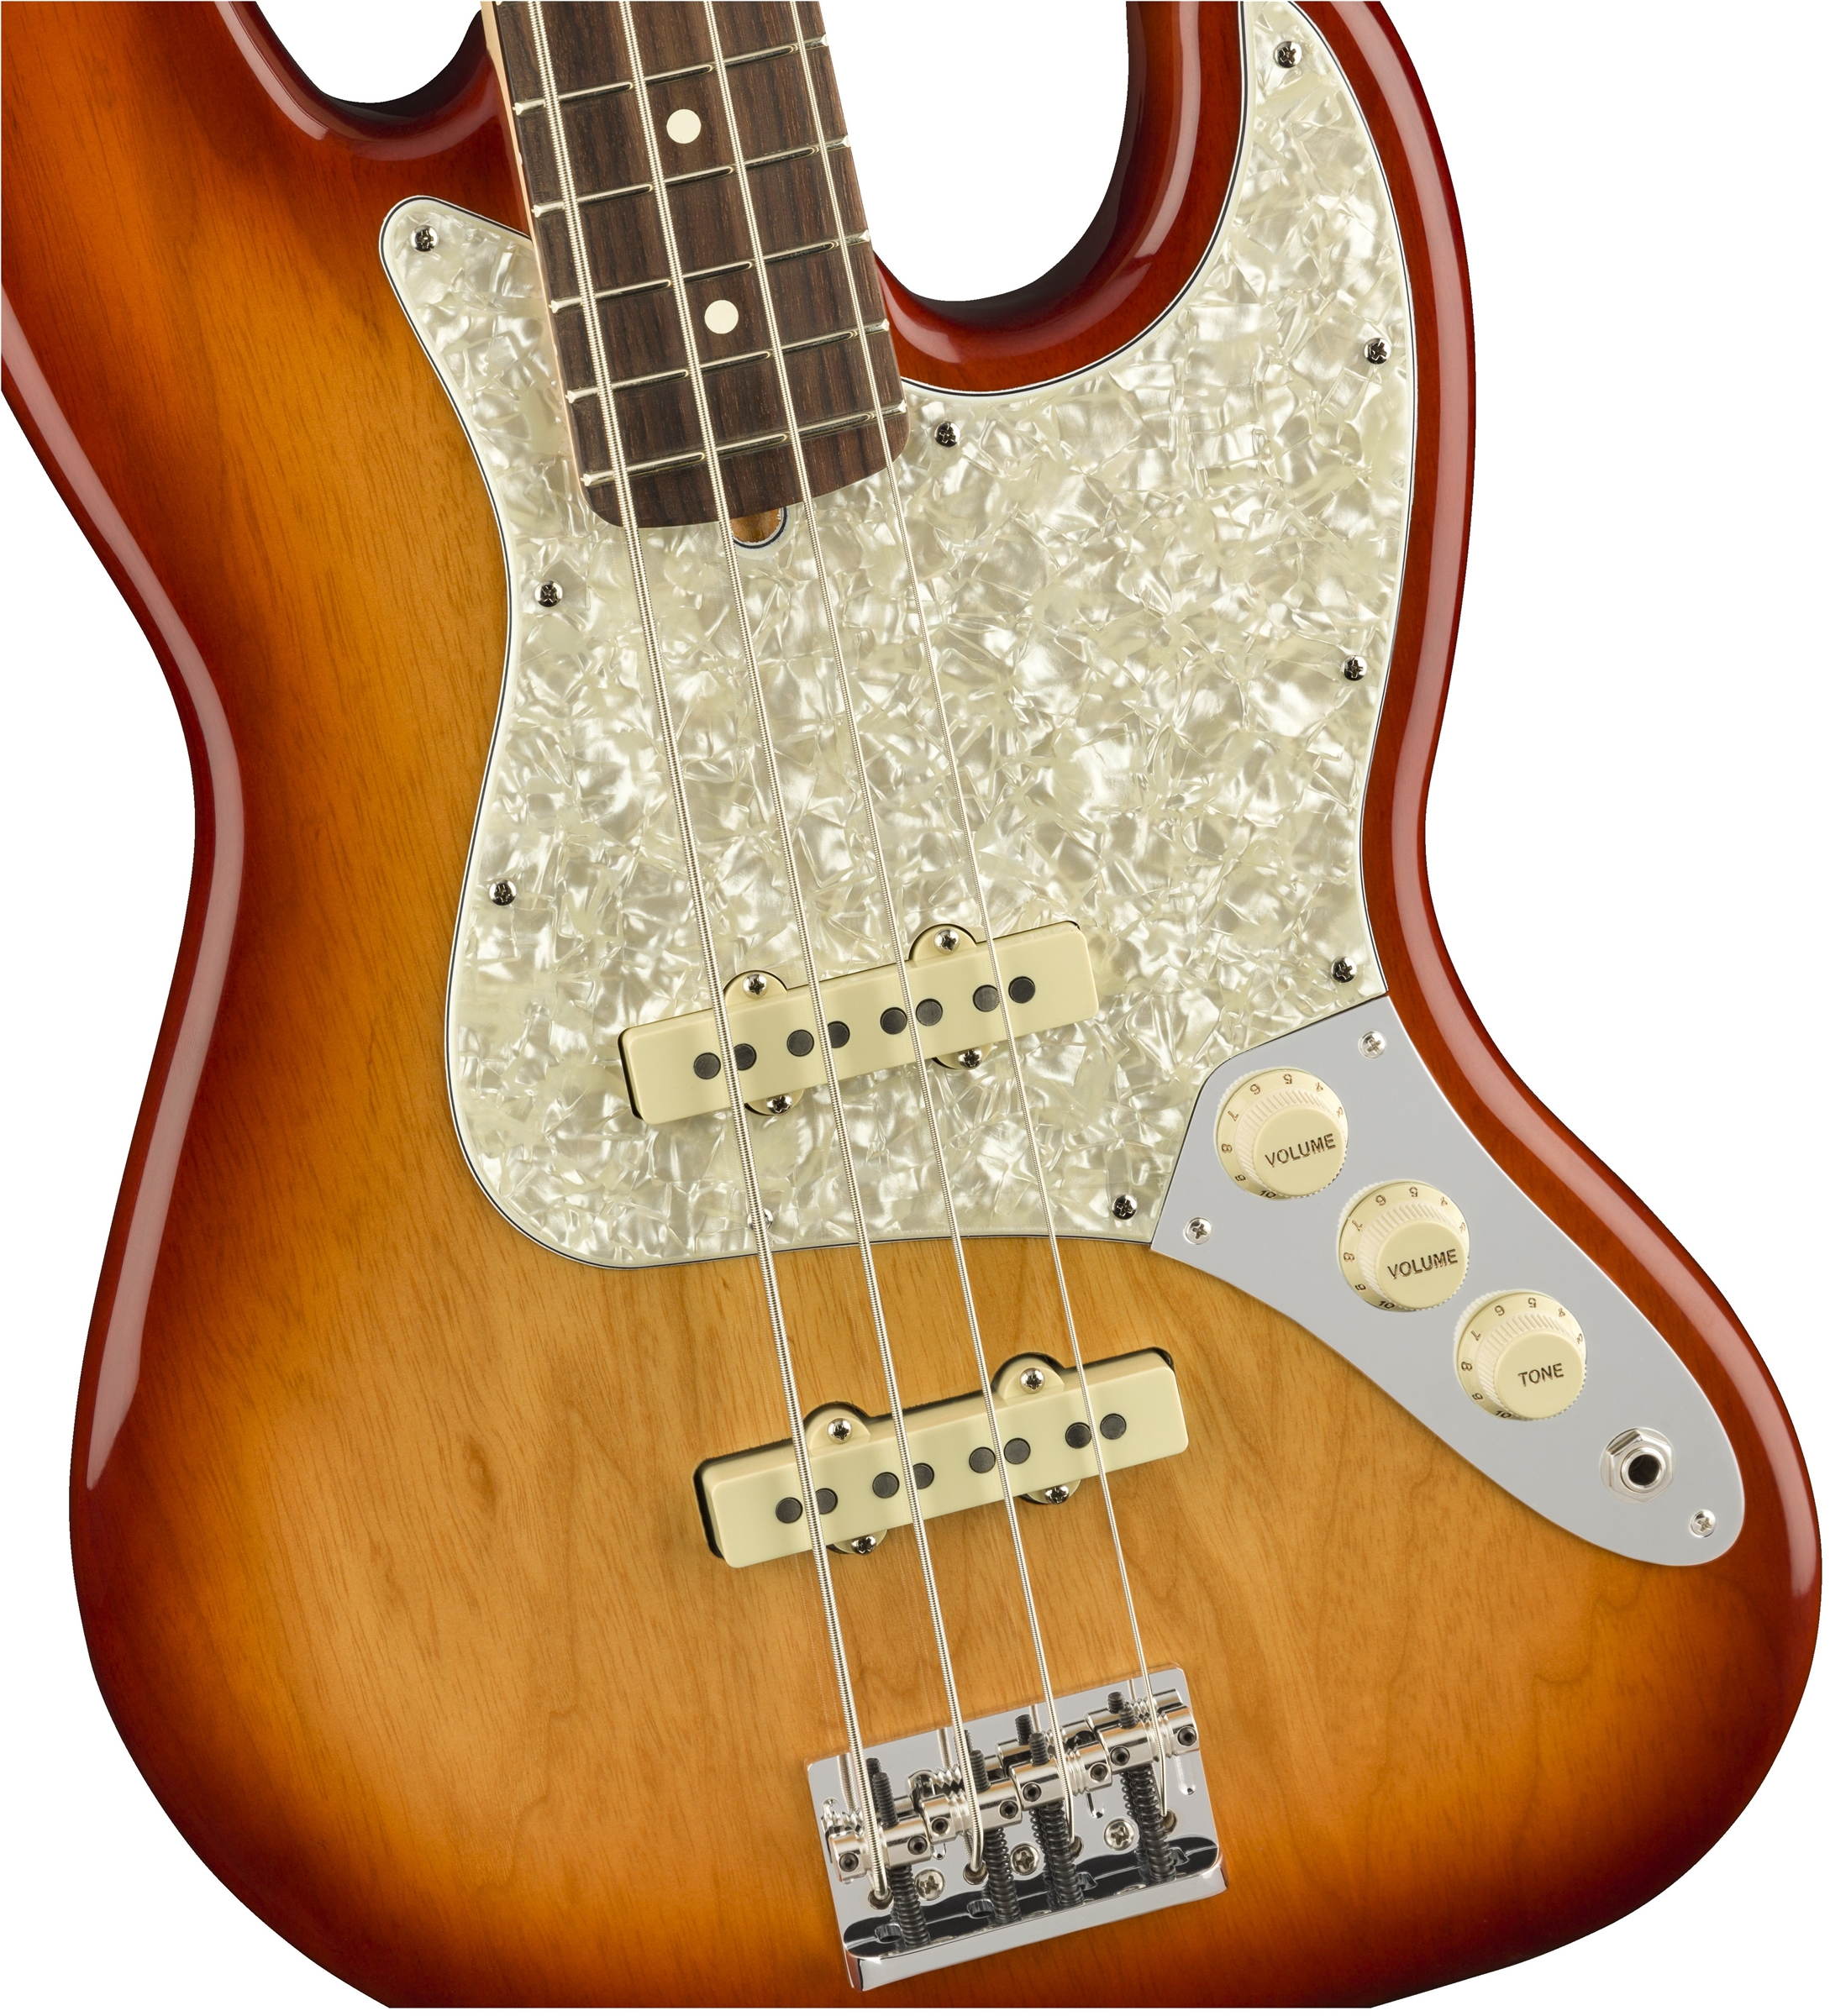 Limited Edition Lightweight Ash American Professional Jazz Bass